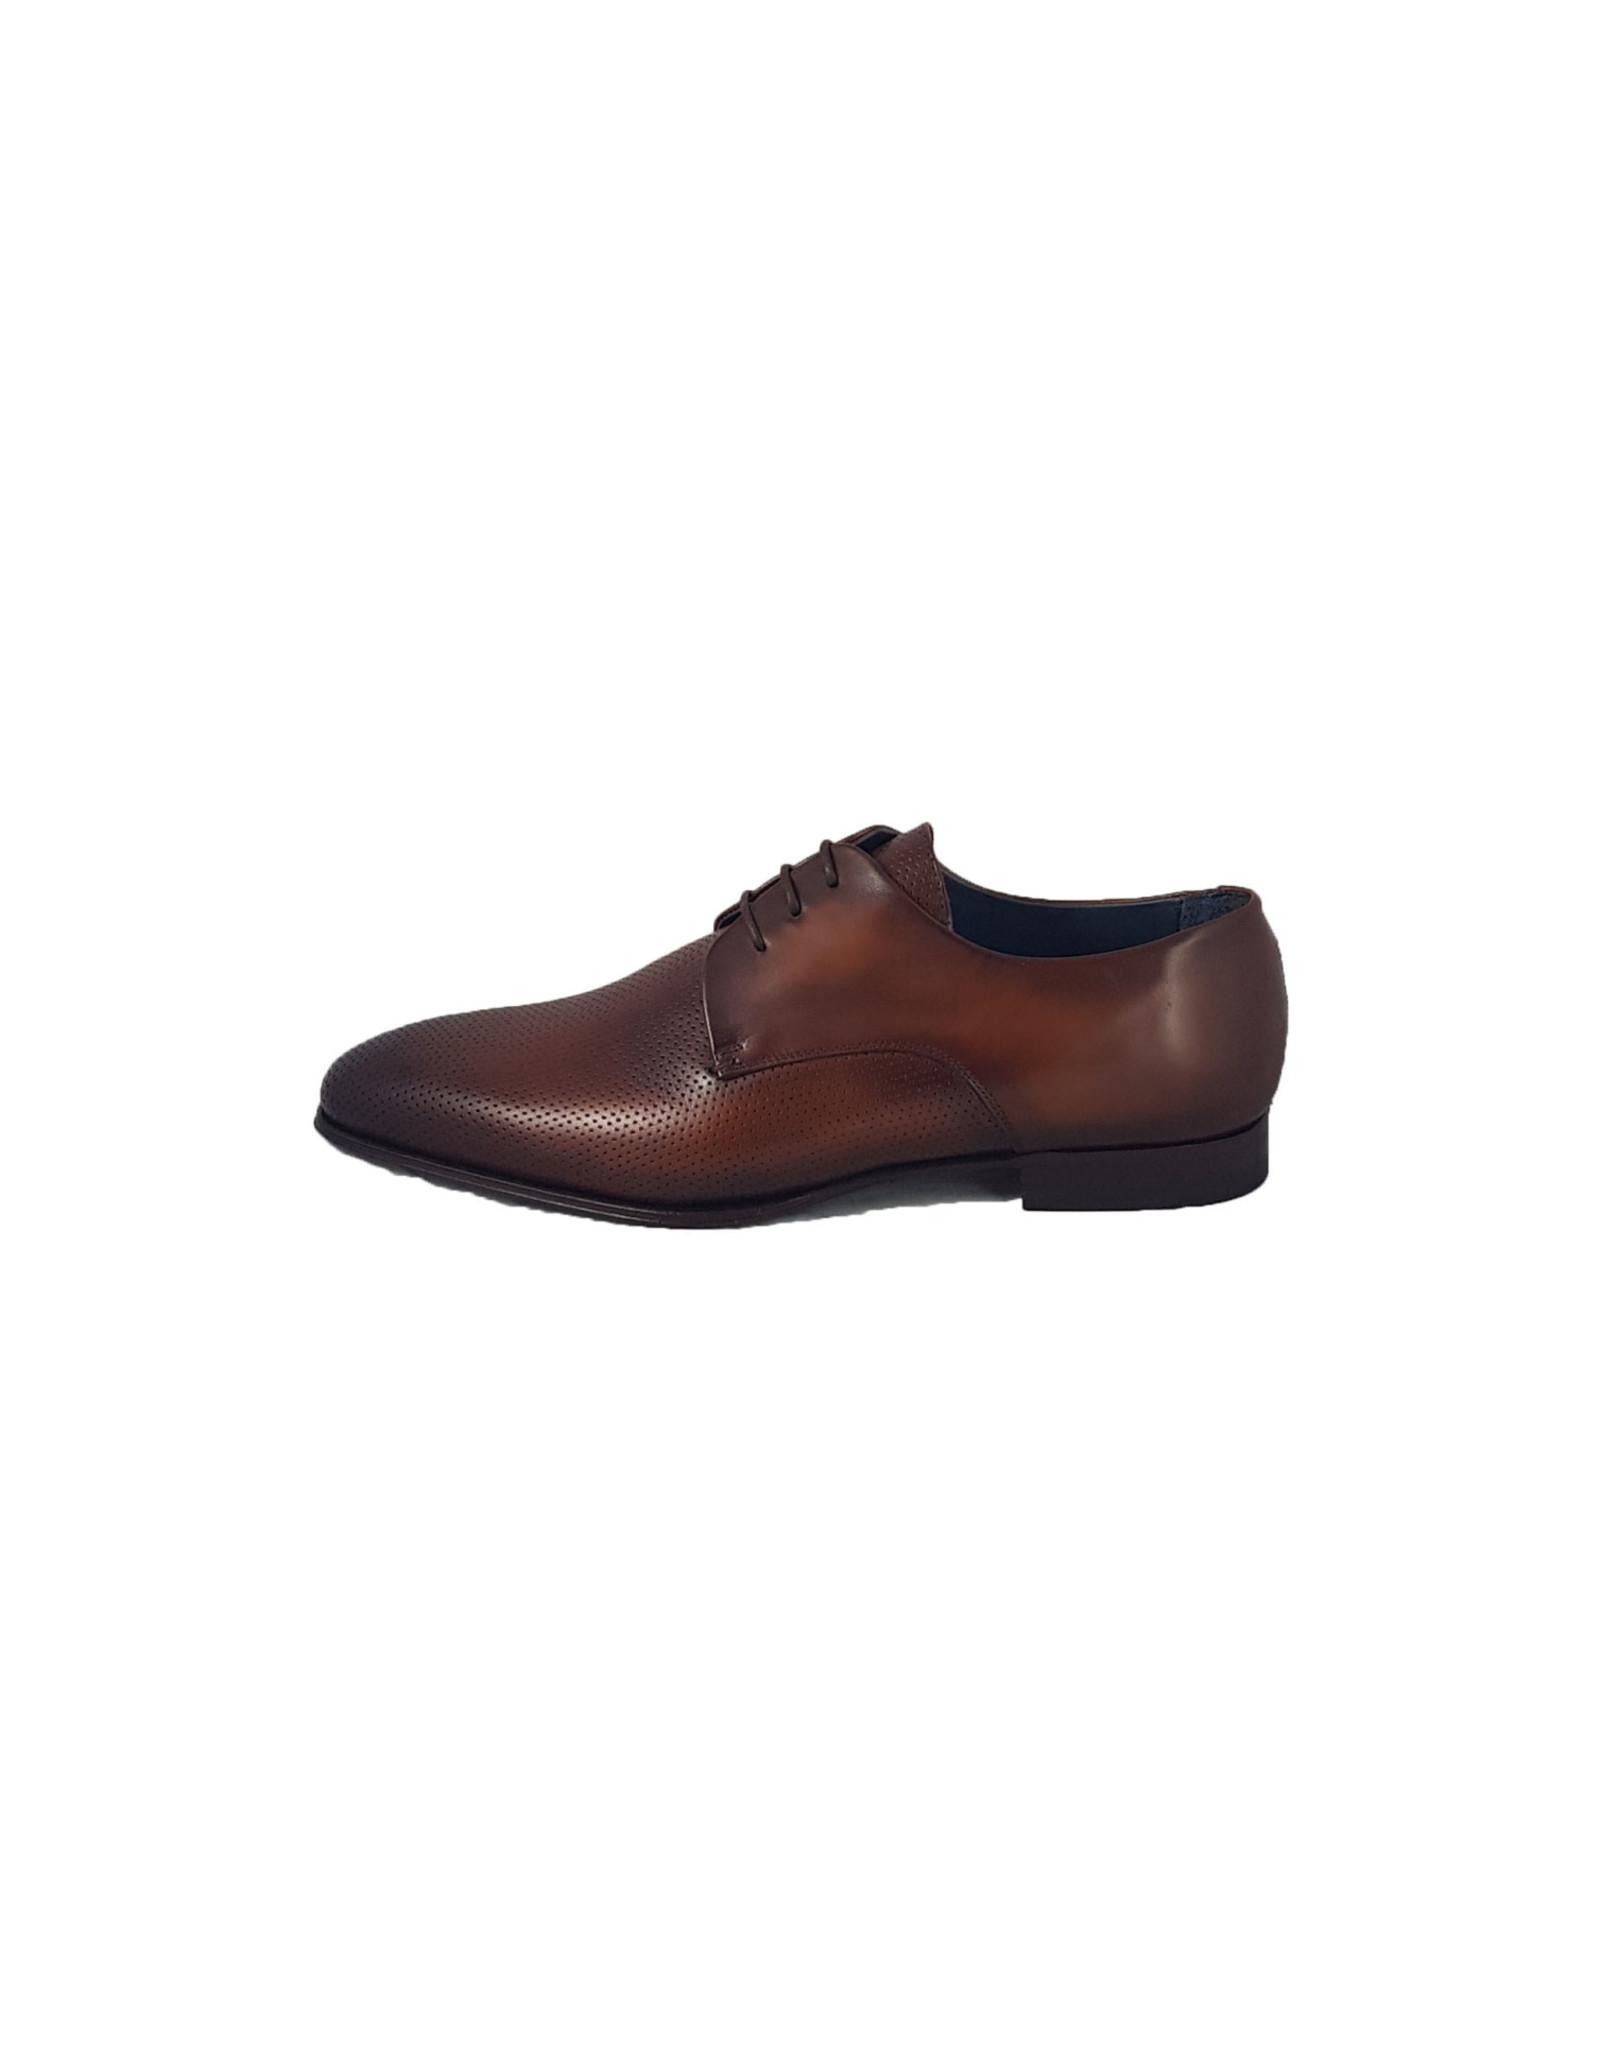 Zampiere Zampiere schoenen cognac Prince cuoio M:5381 V18